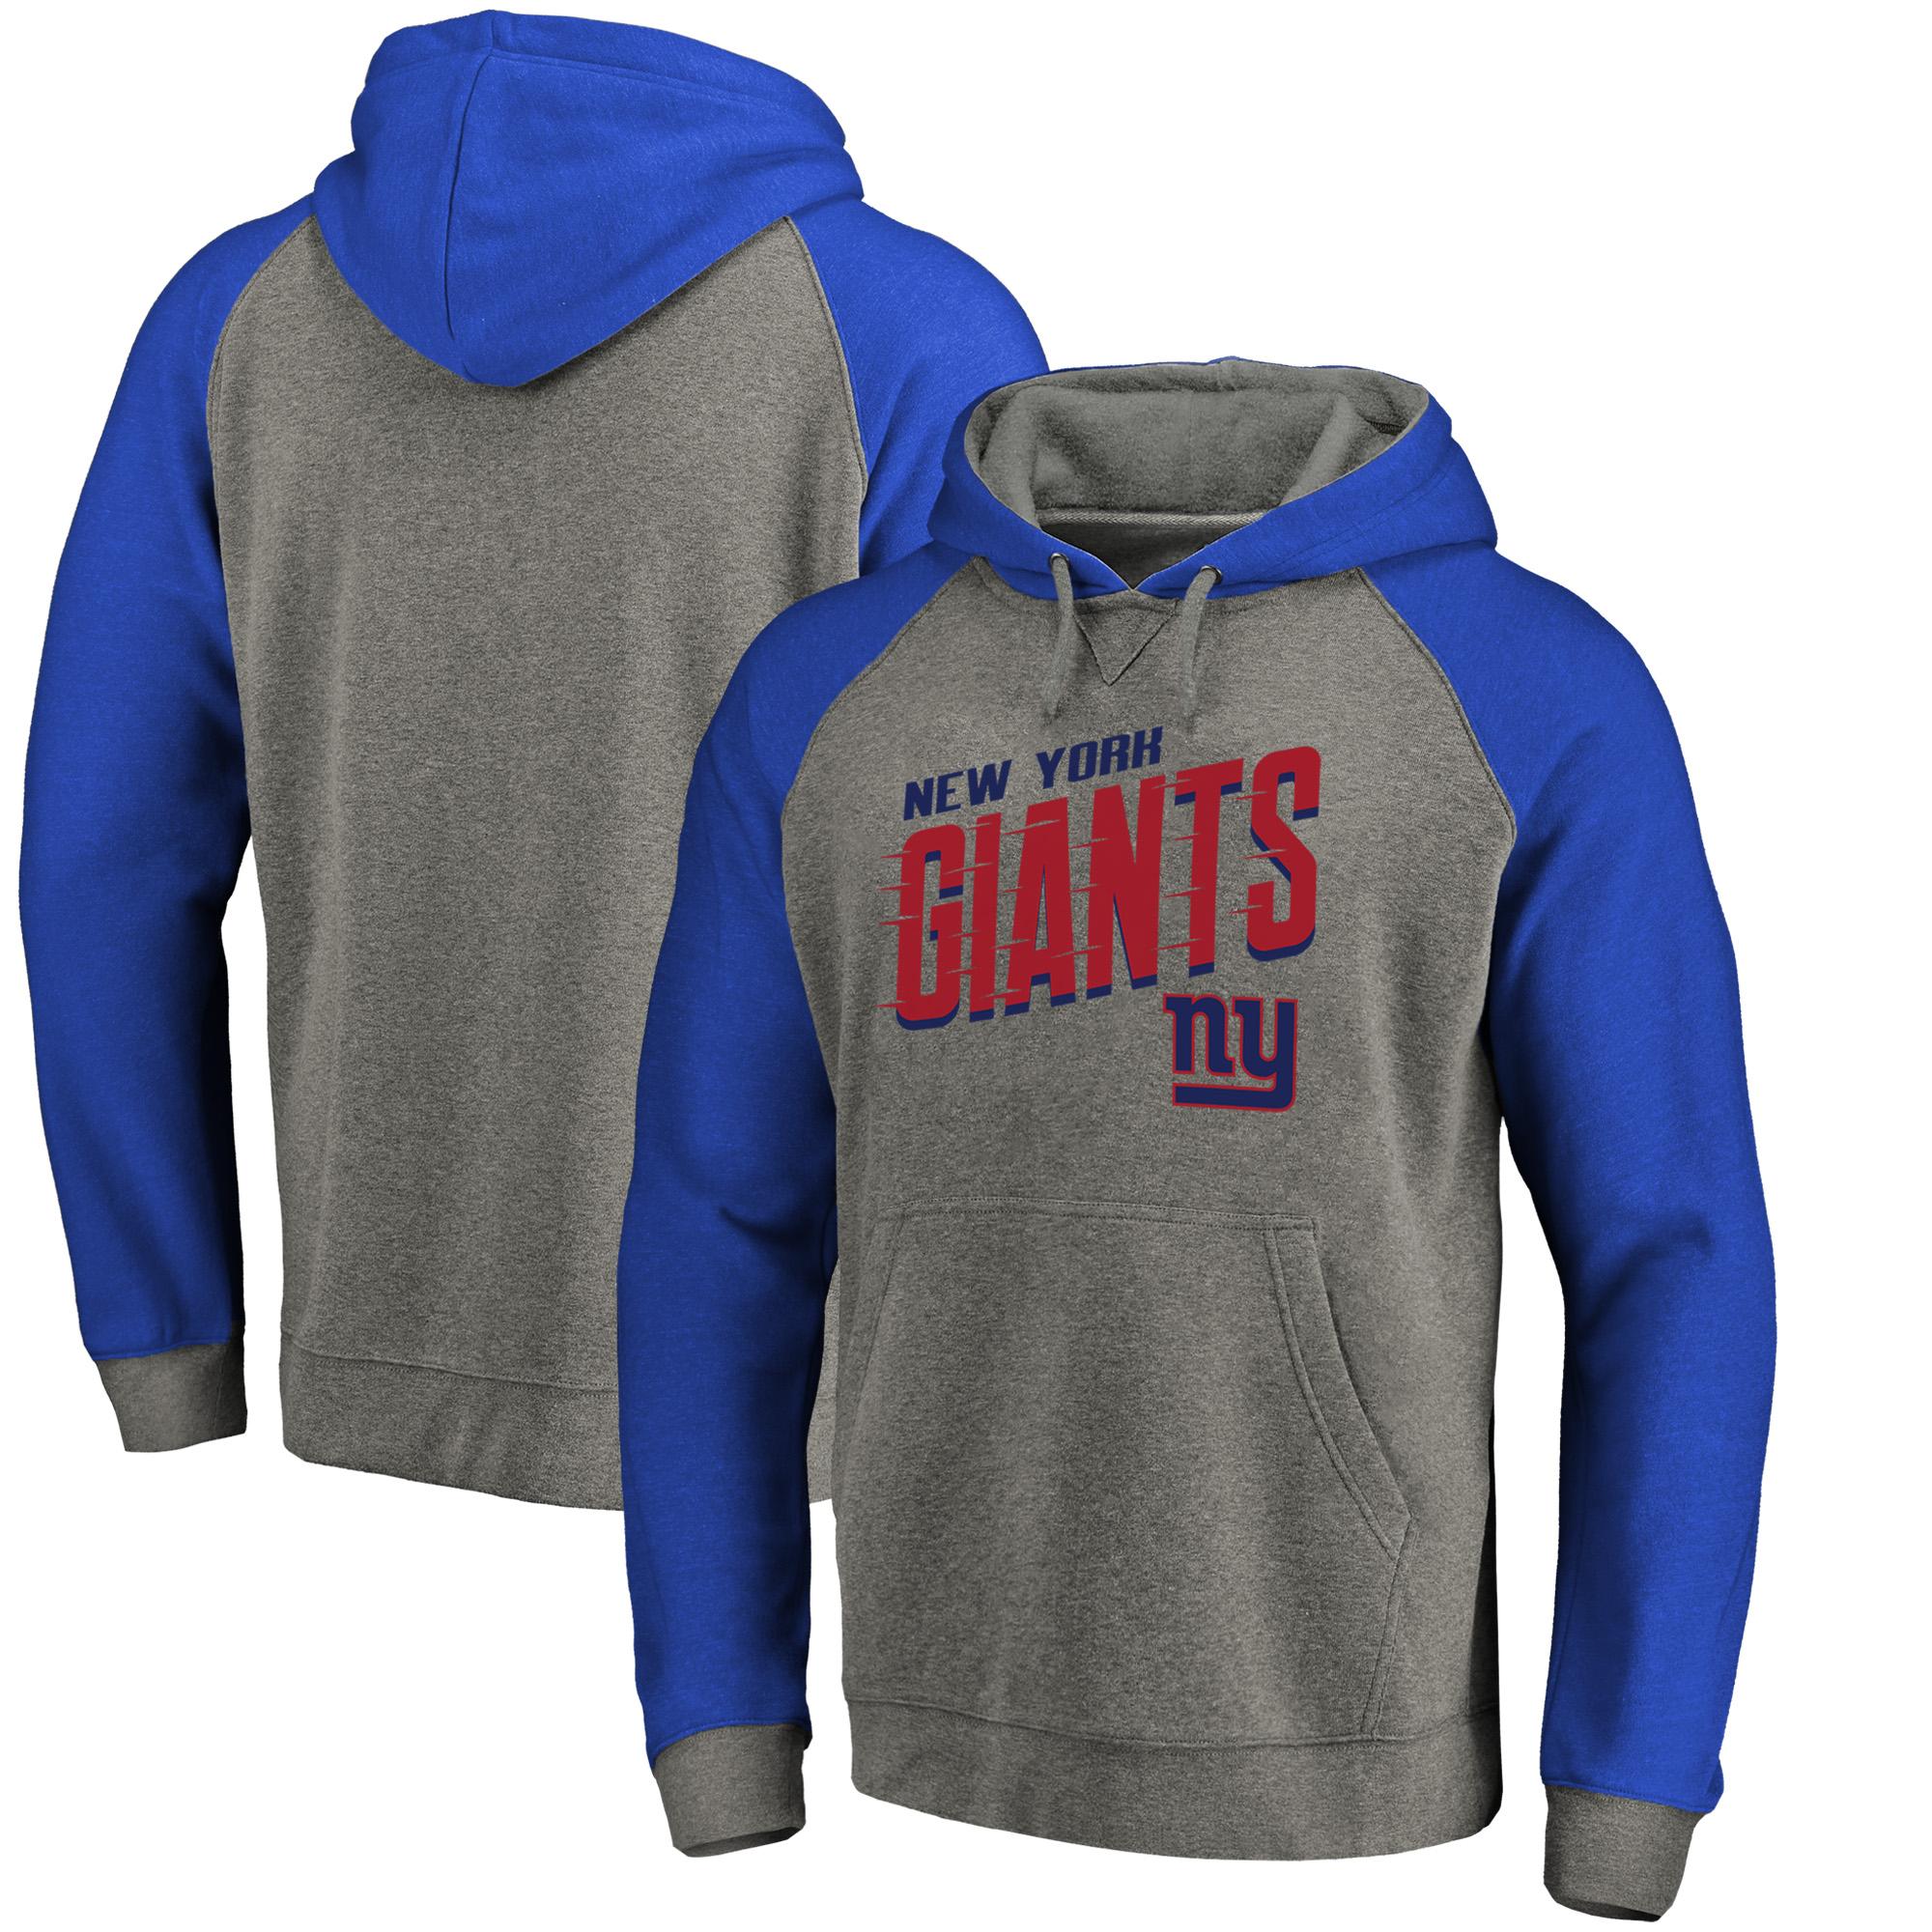 New York Giants NFL Pro Line by Fanatics Branded Big & Tall Slant Strike Tri-Blend Raglan Pullover Hoodie - Heathered Gray